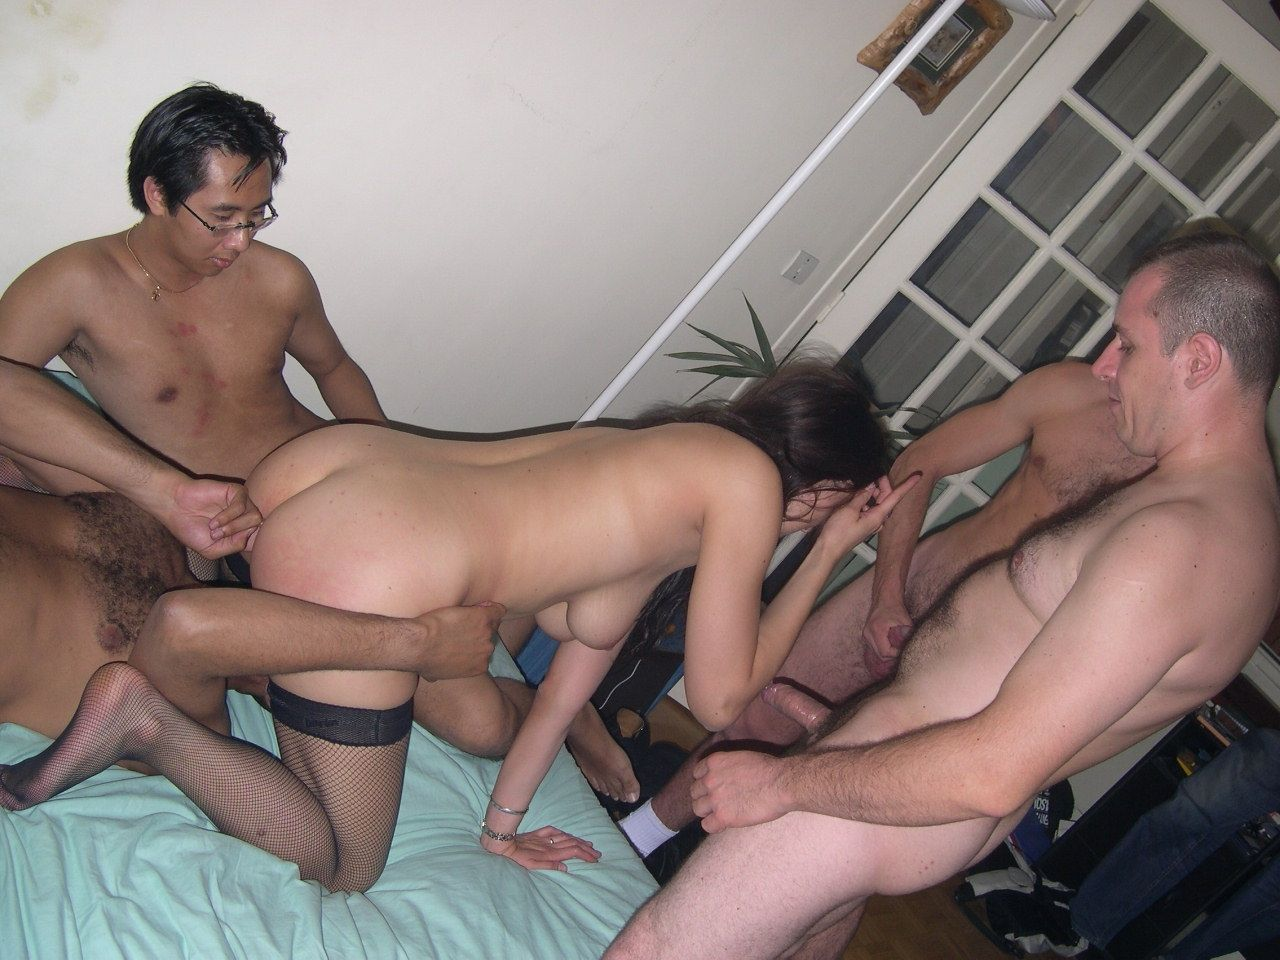 hot-sex-amature-group-sex-tube-obasan-gallery-huge